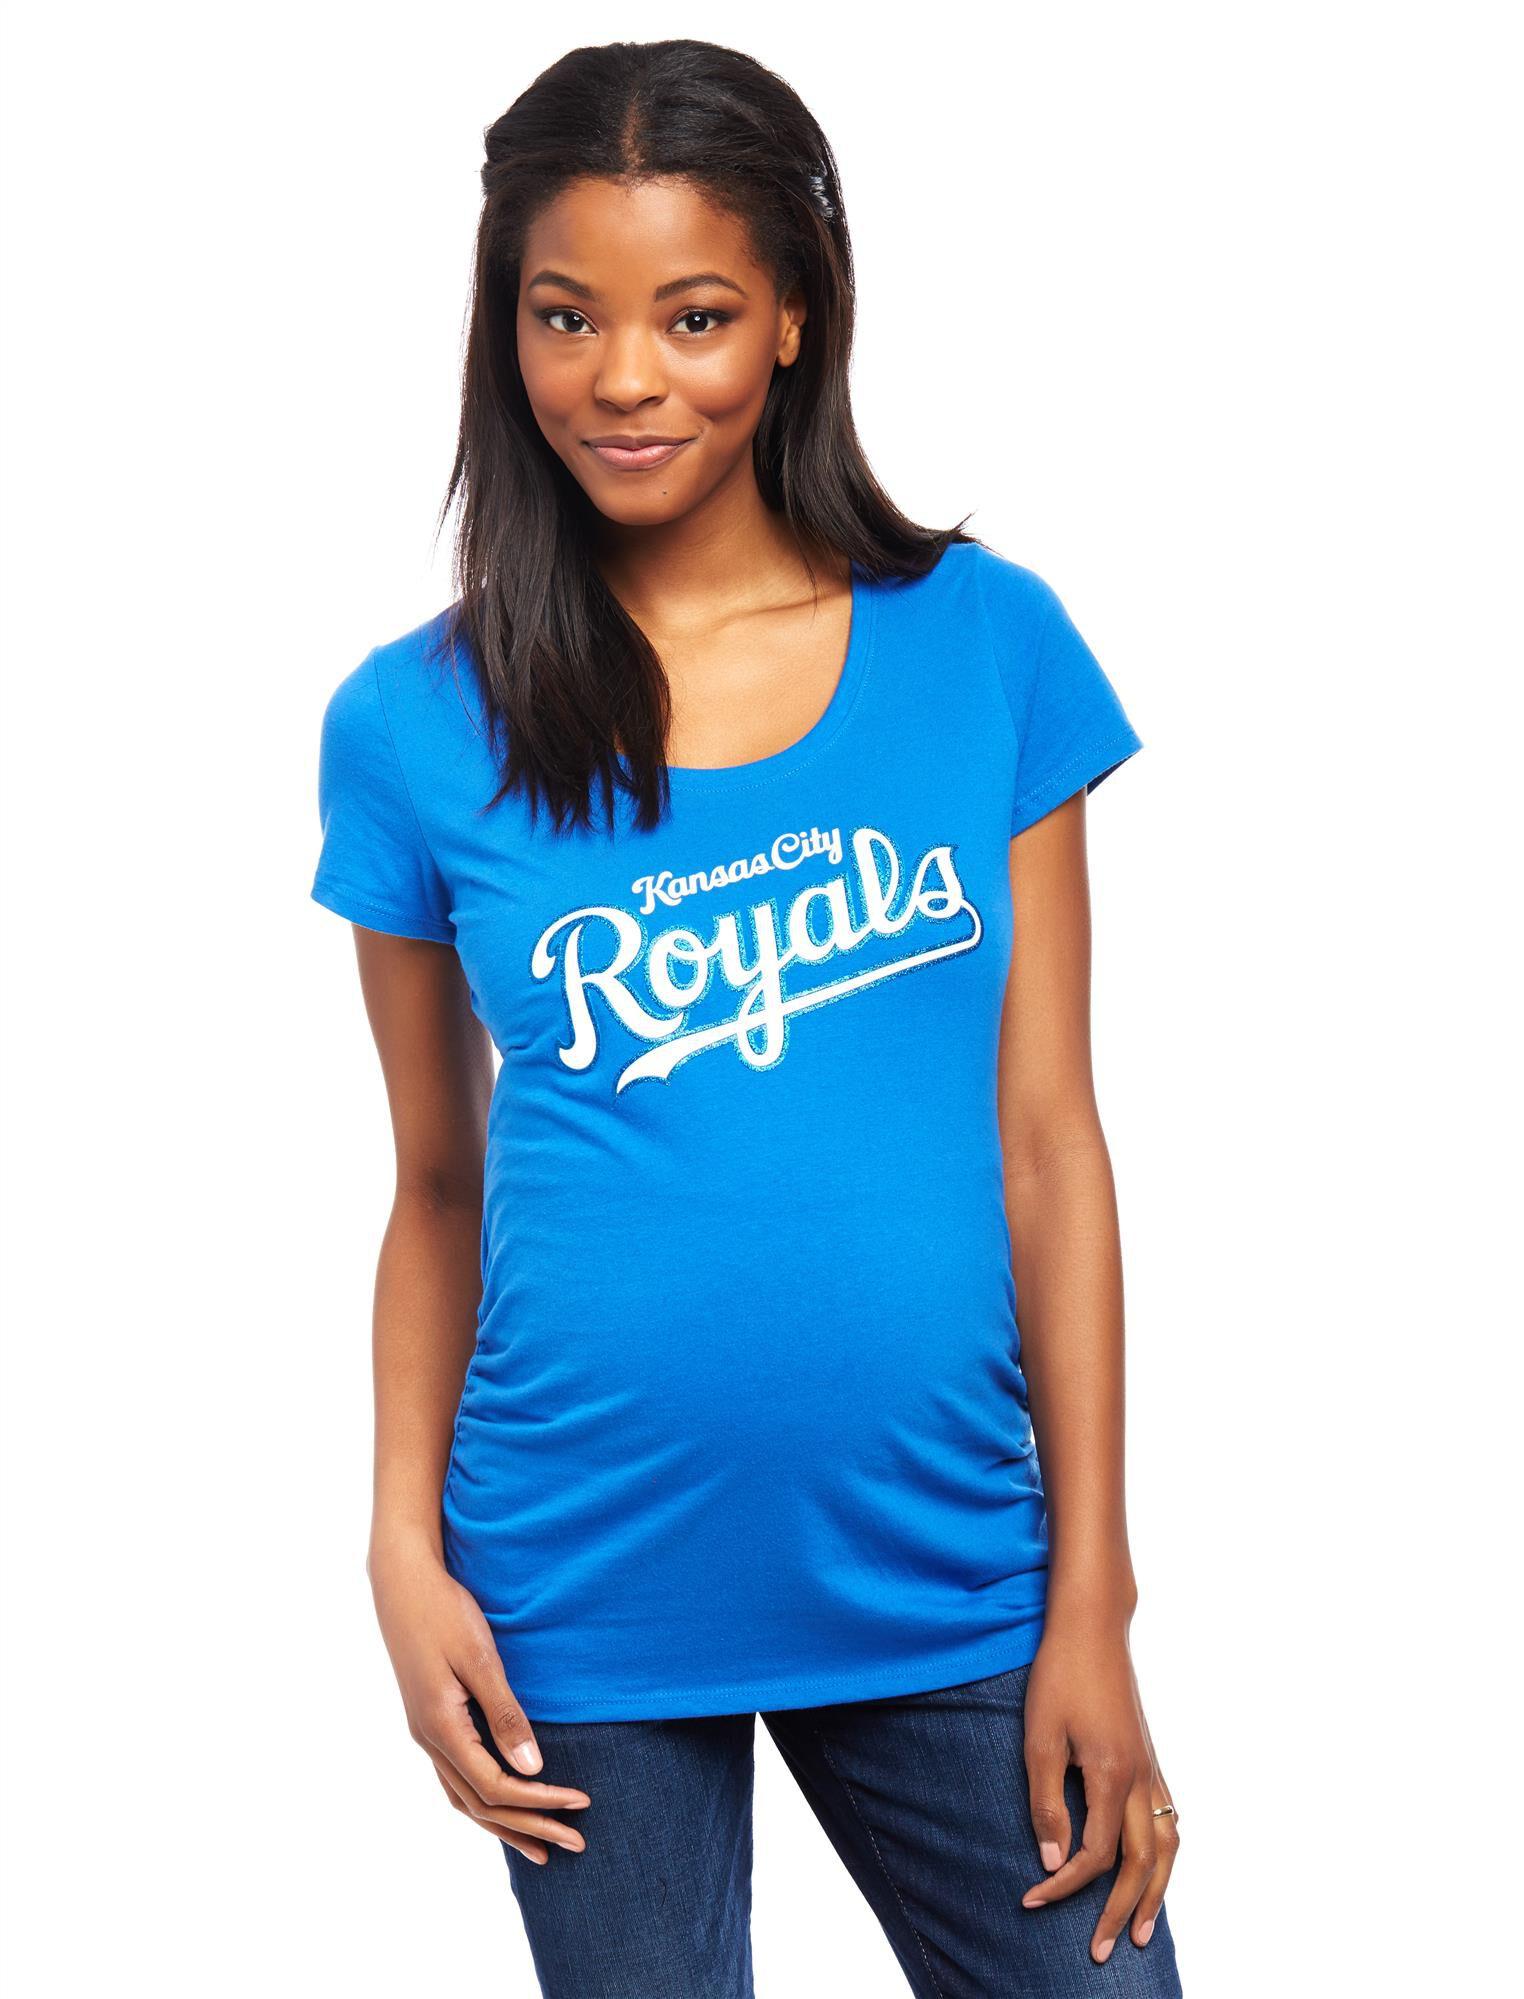 Kansas City Royals MLB You're Out Maternity Tee